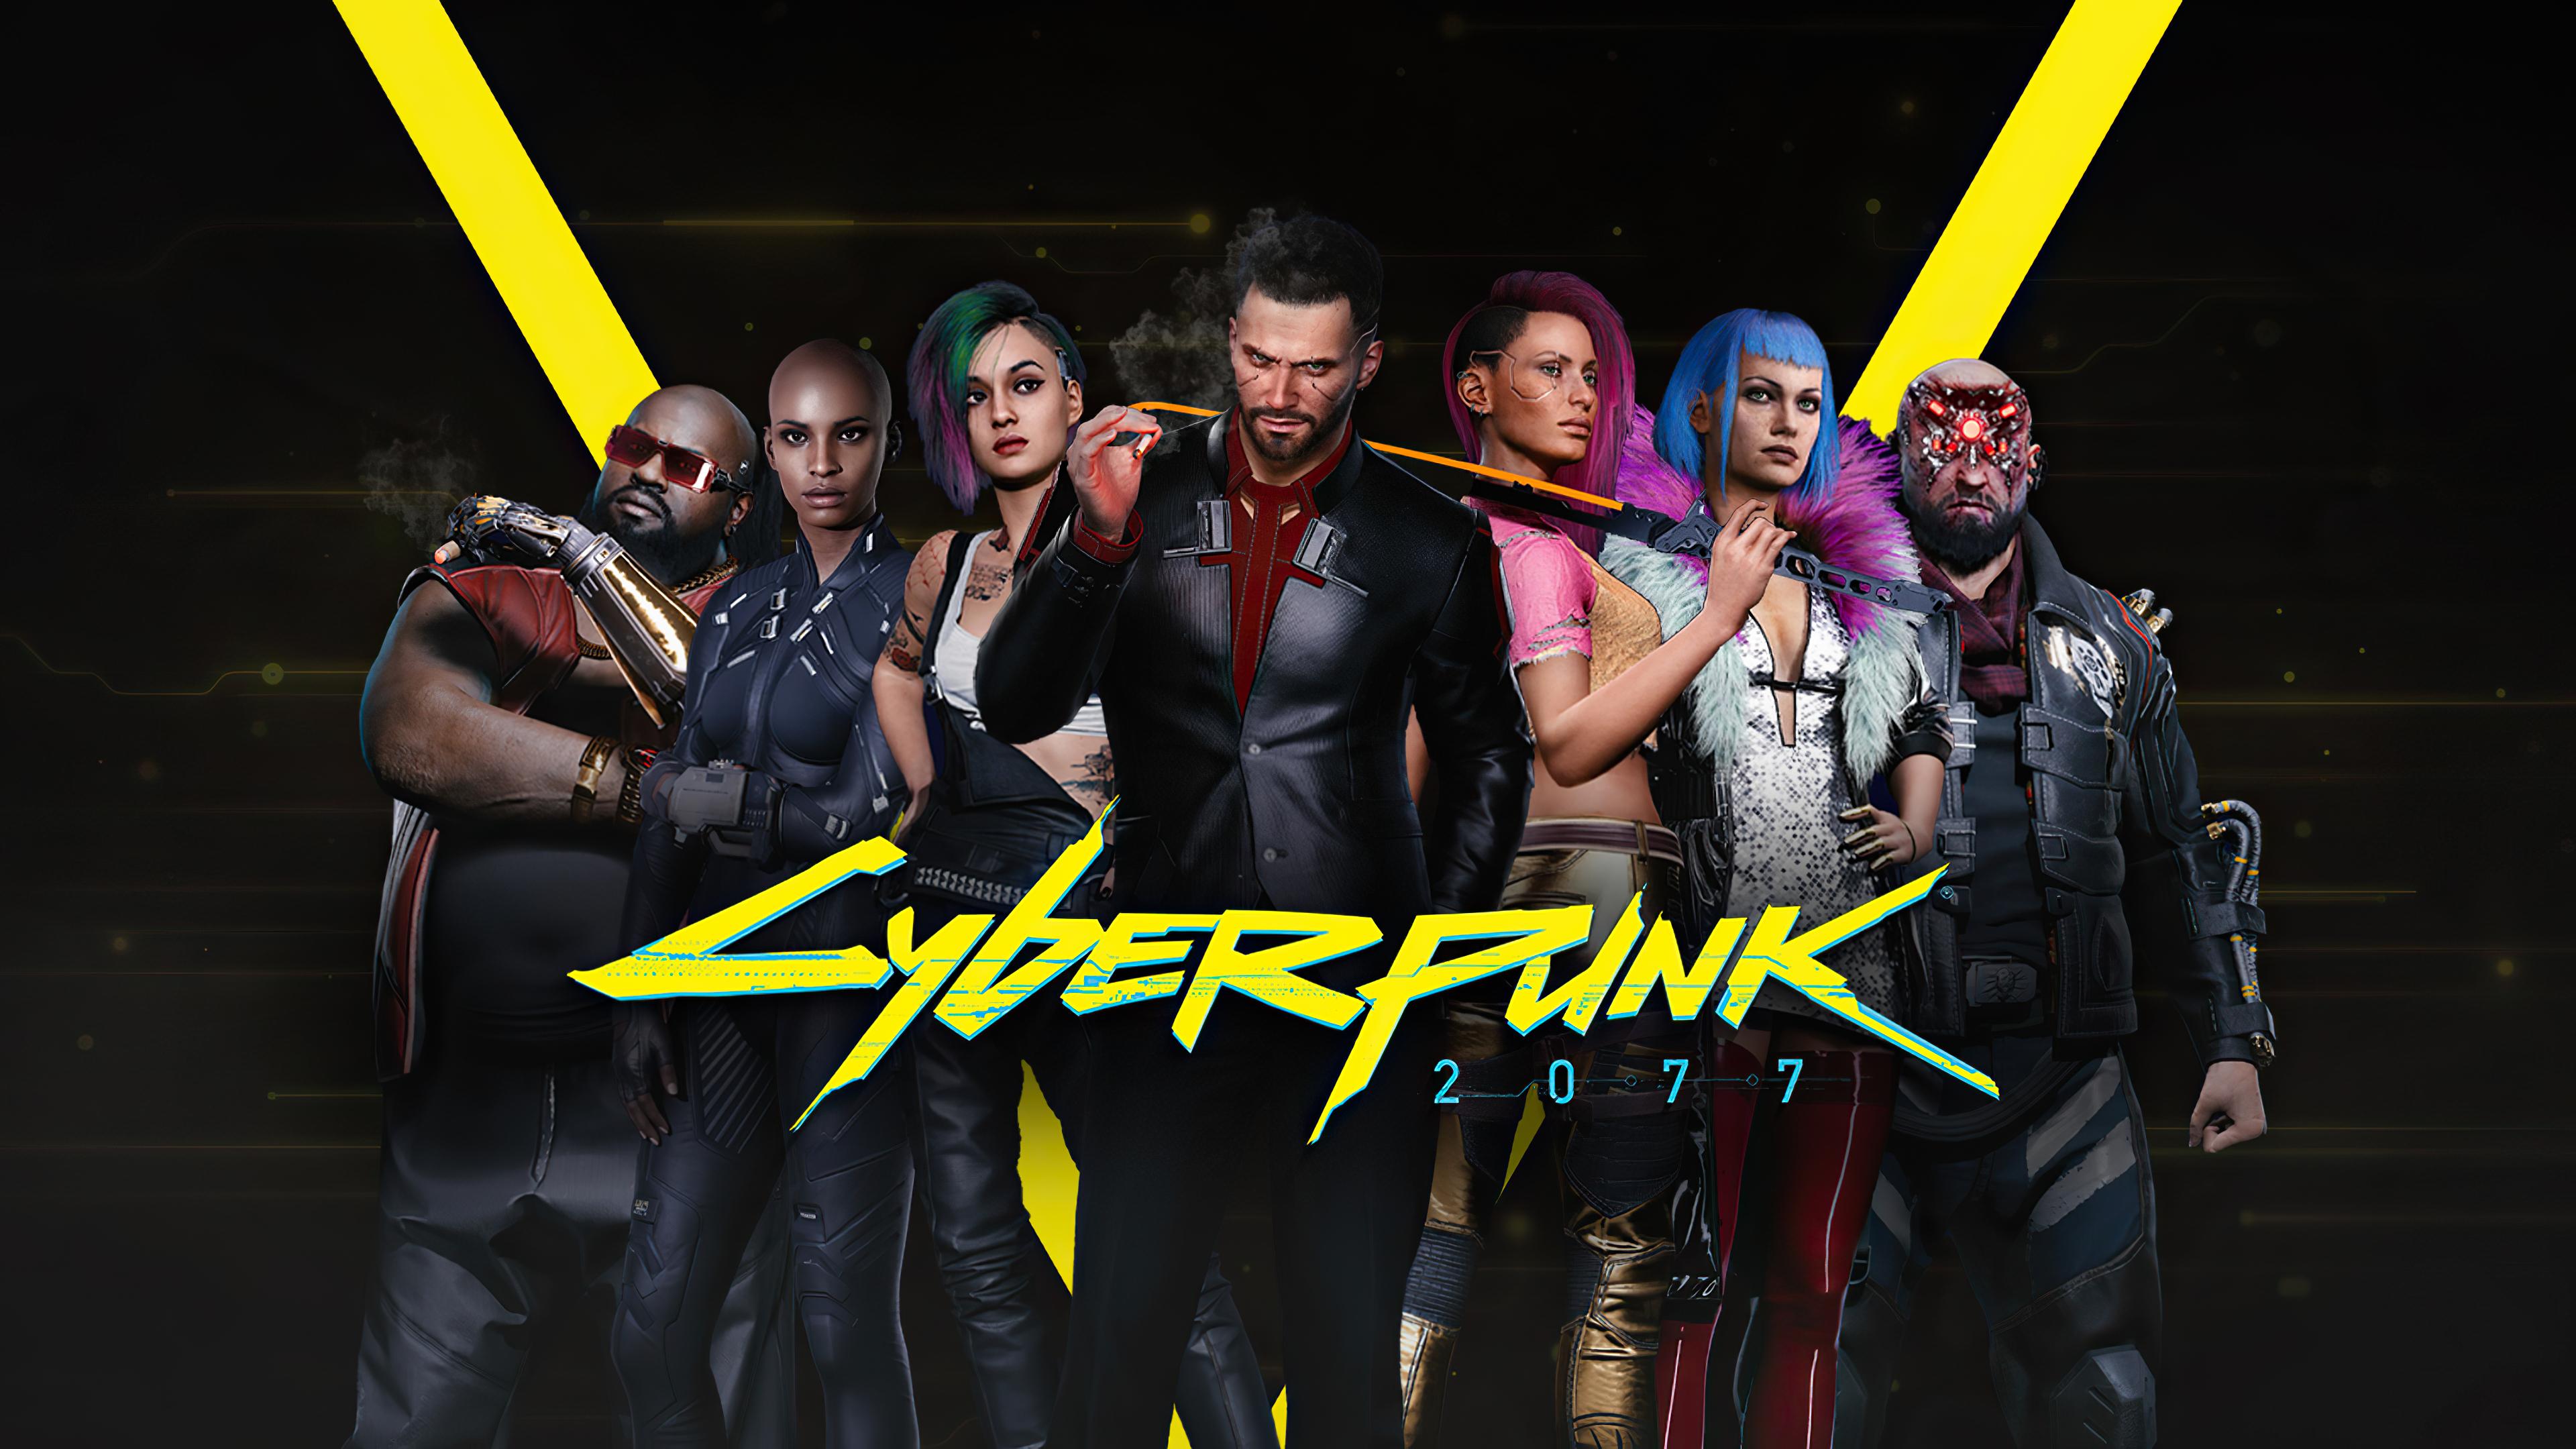 Cyberpunk 2077 4k Characters Wallpaper, HD Games 4K ...